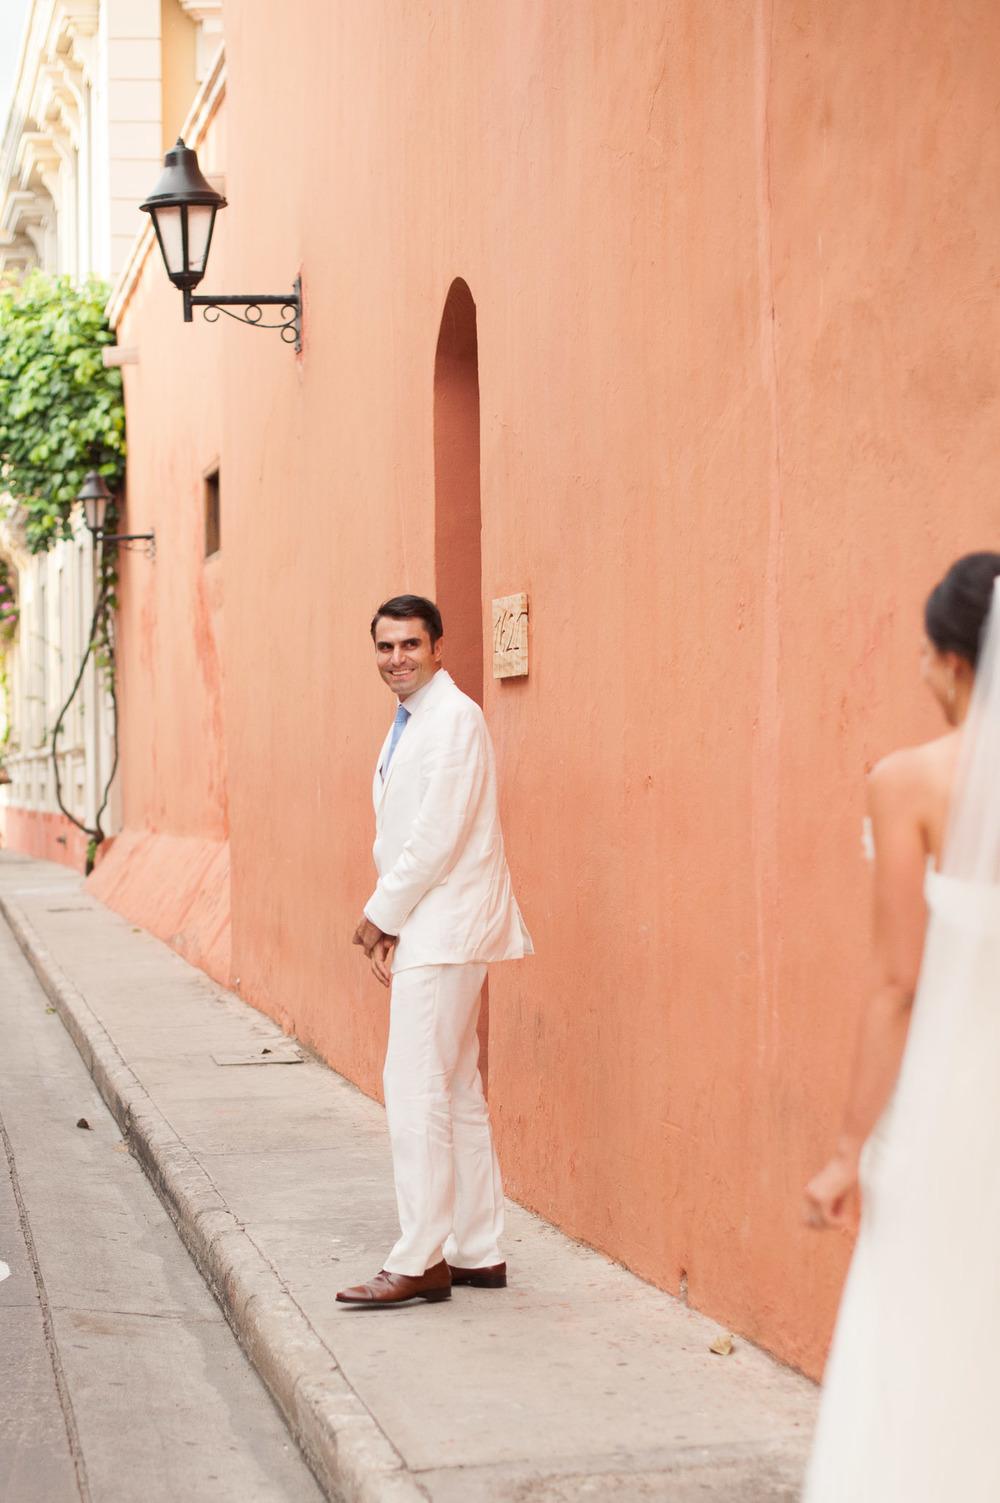 boda en cartagena_pablosalgado__PSB7270.jpg